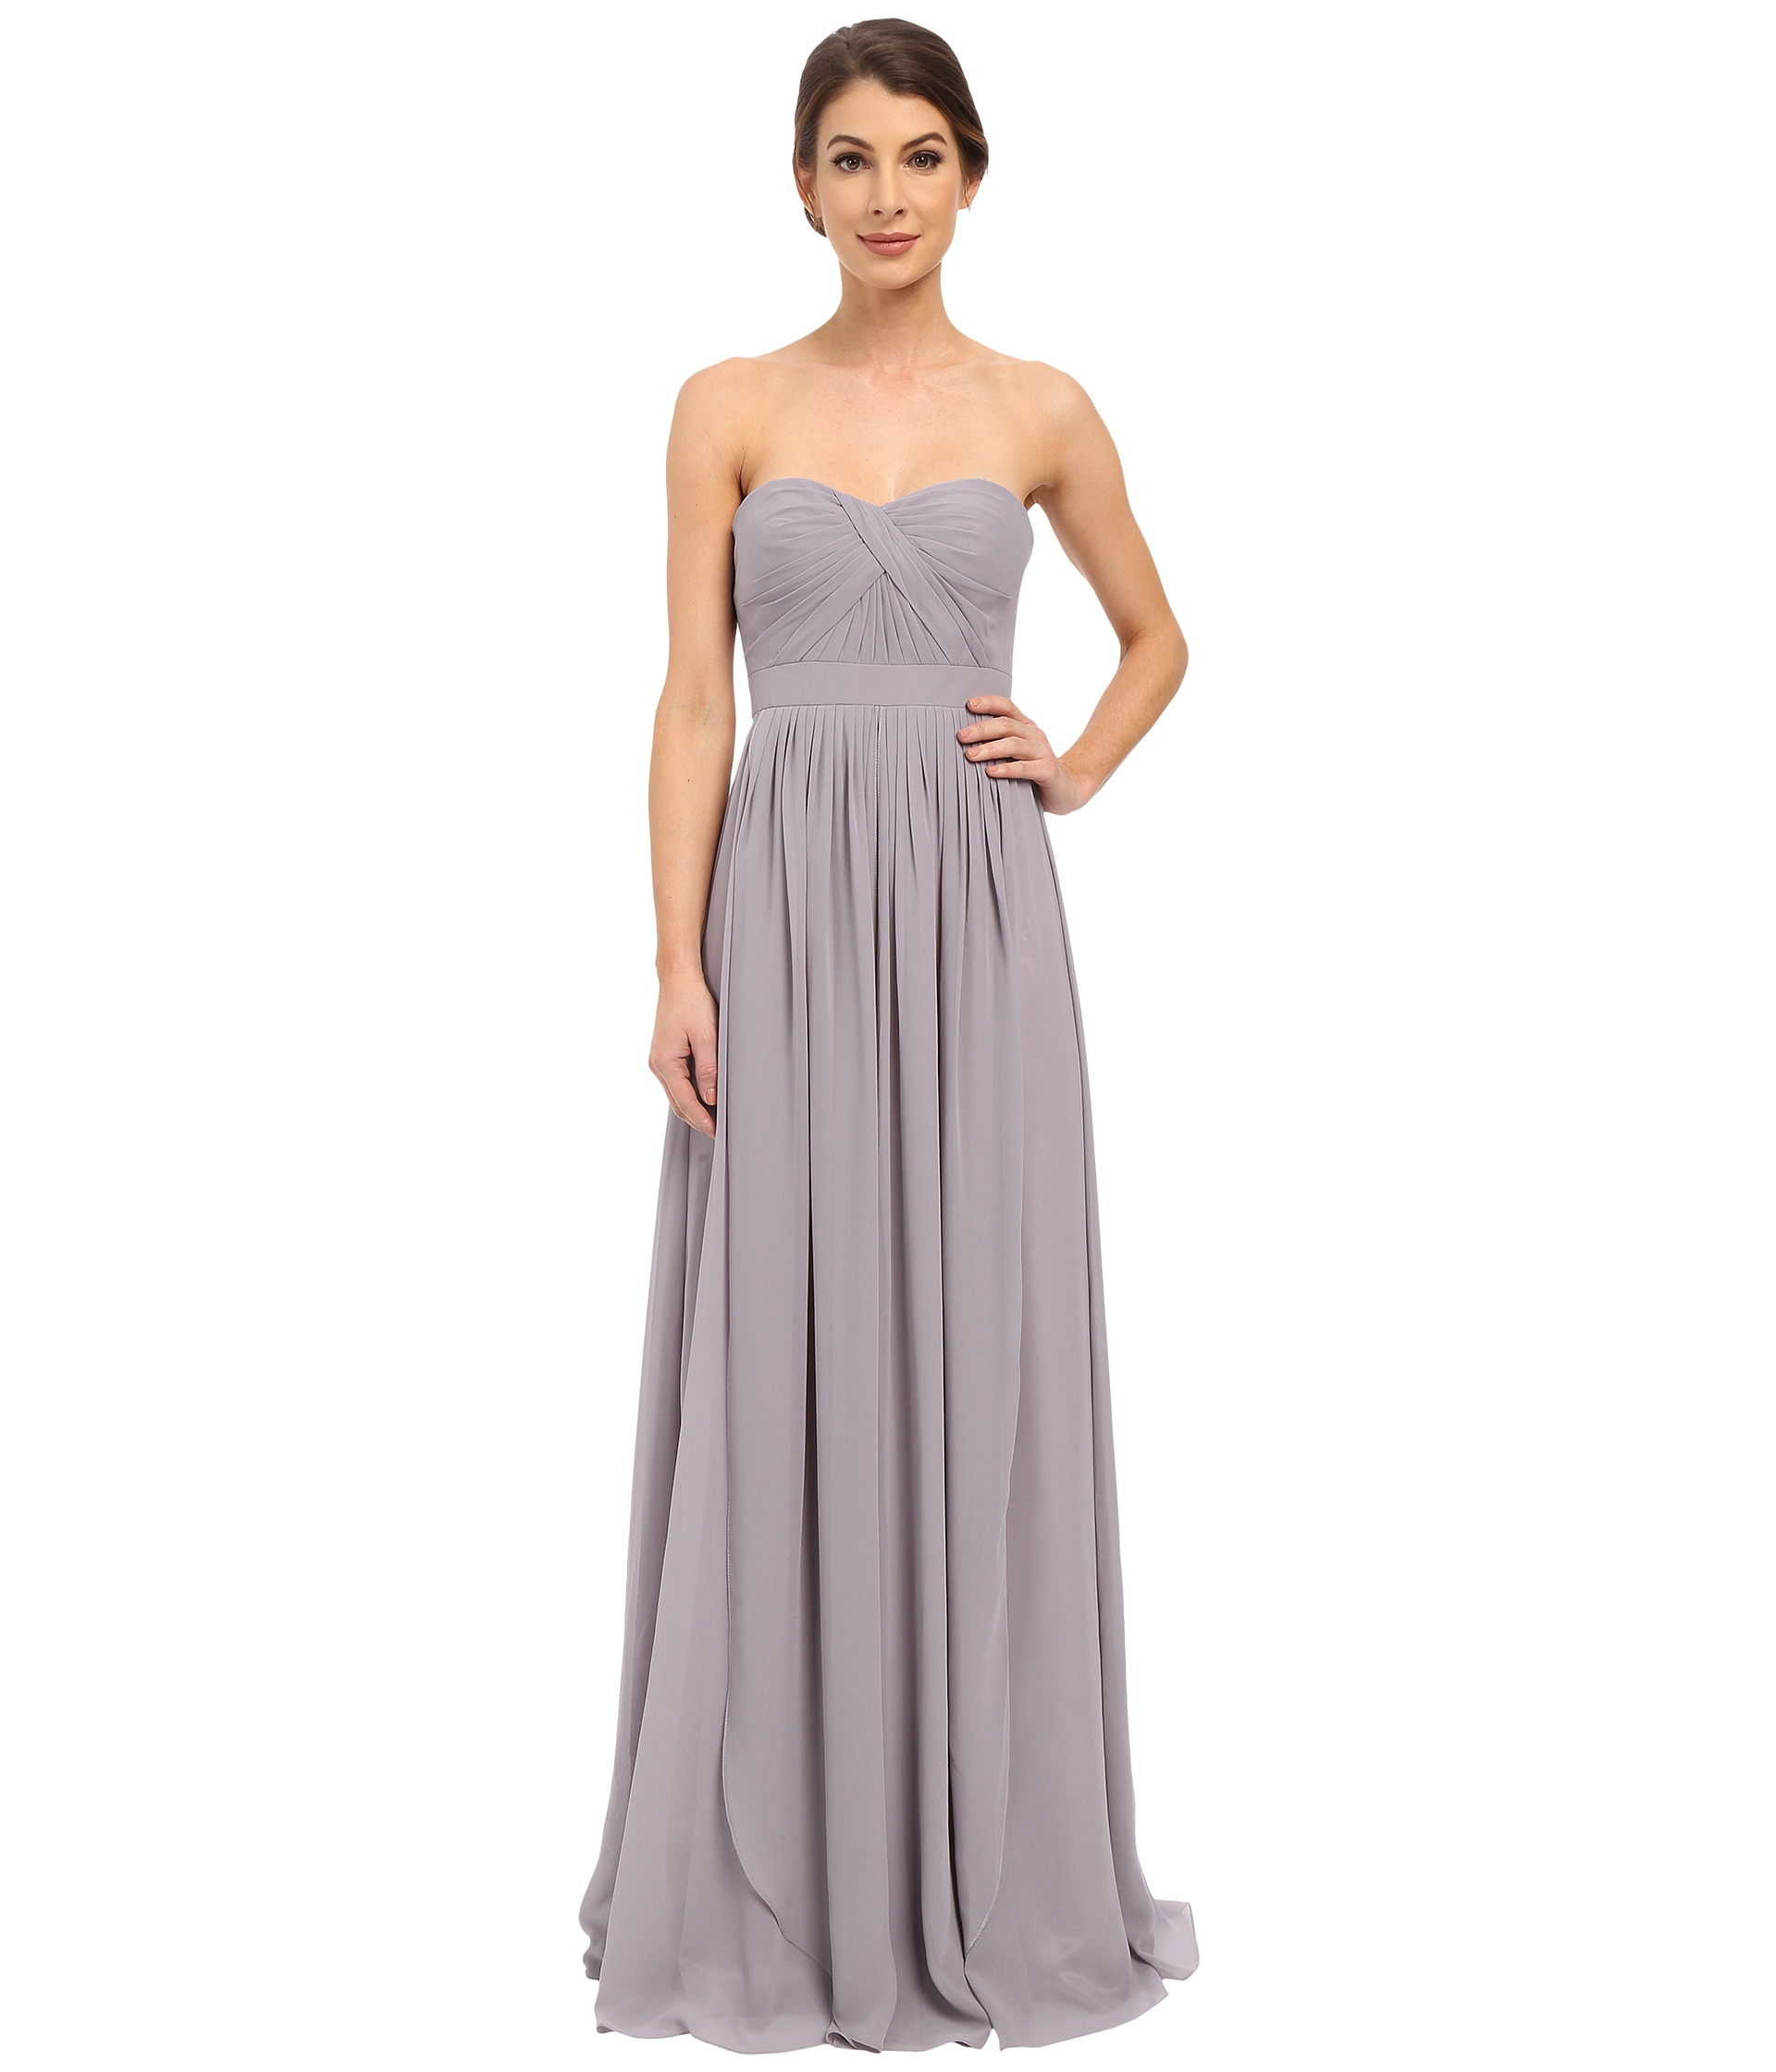 Faviana Strapless Chiffon Convertible Dress 7822 in Gray | Lyst